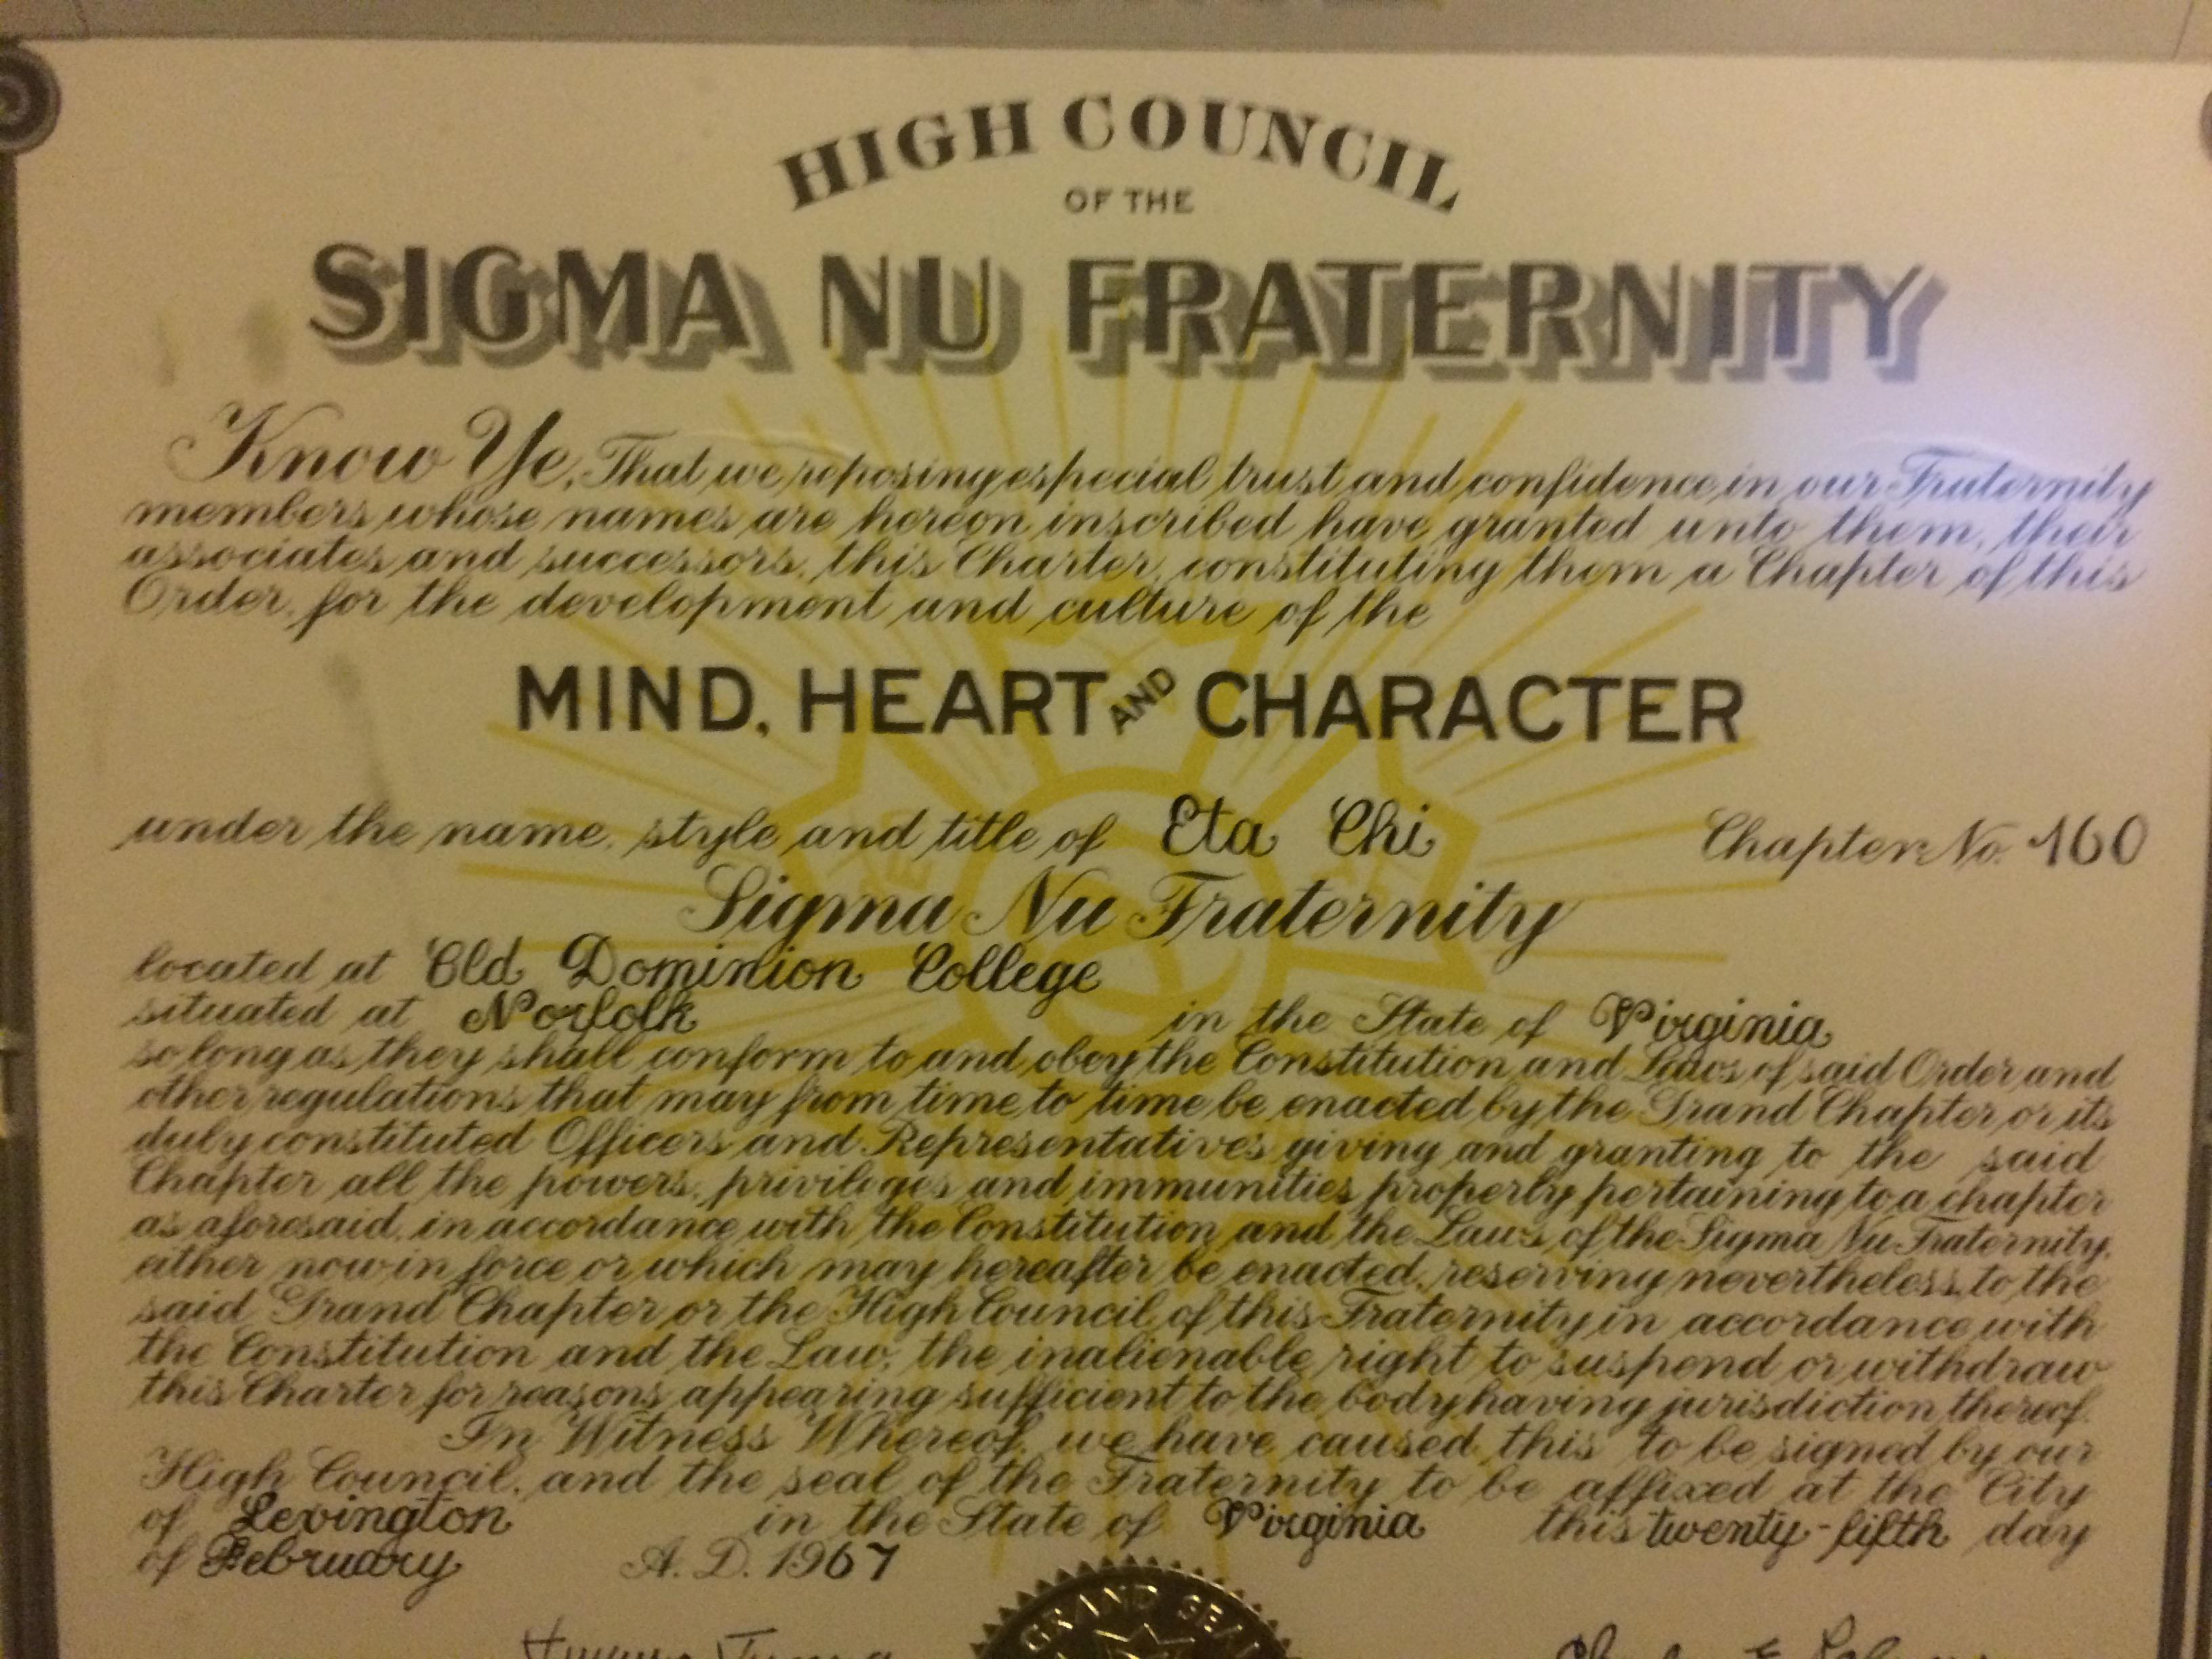 Charter Statement